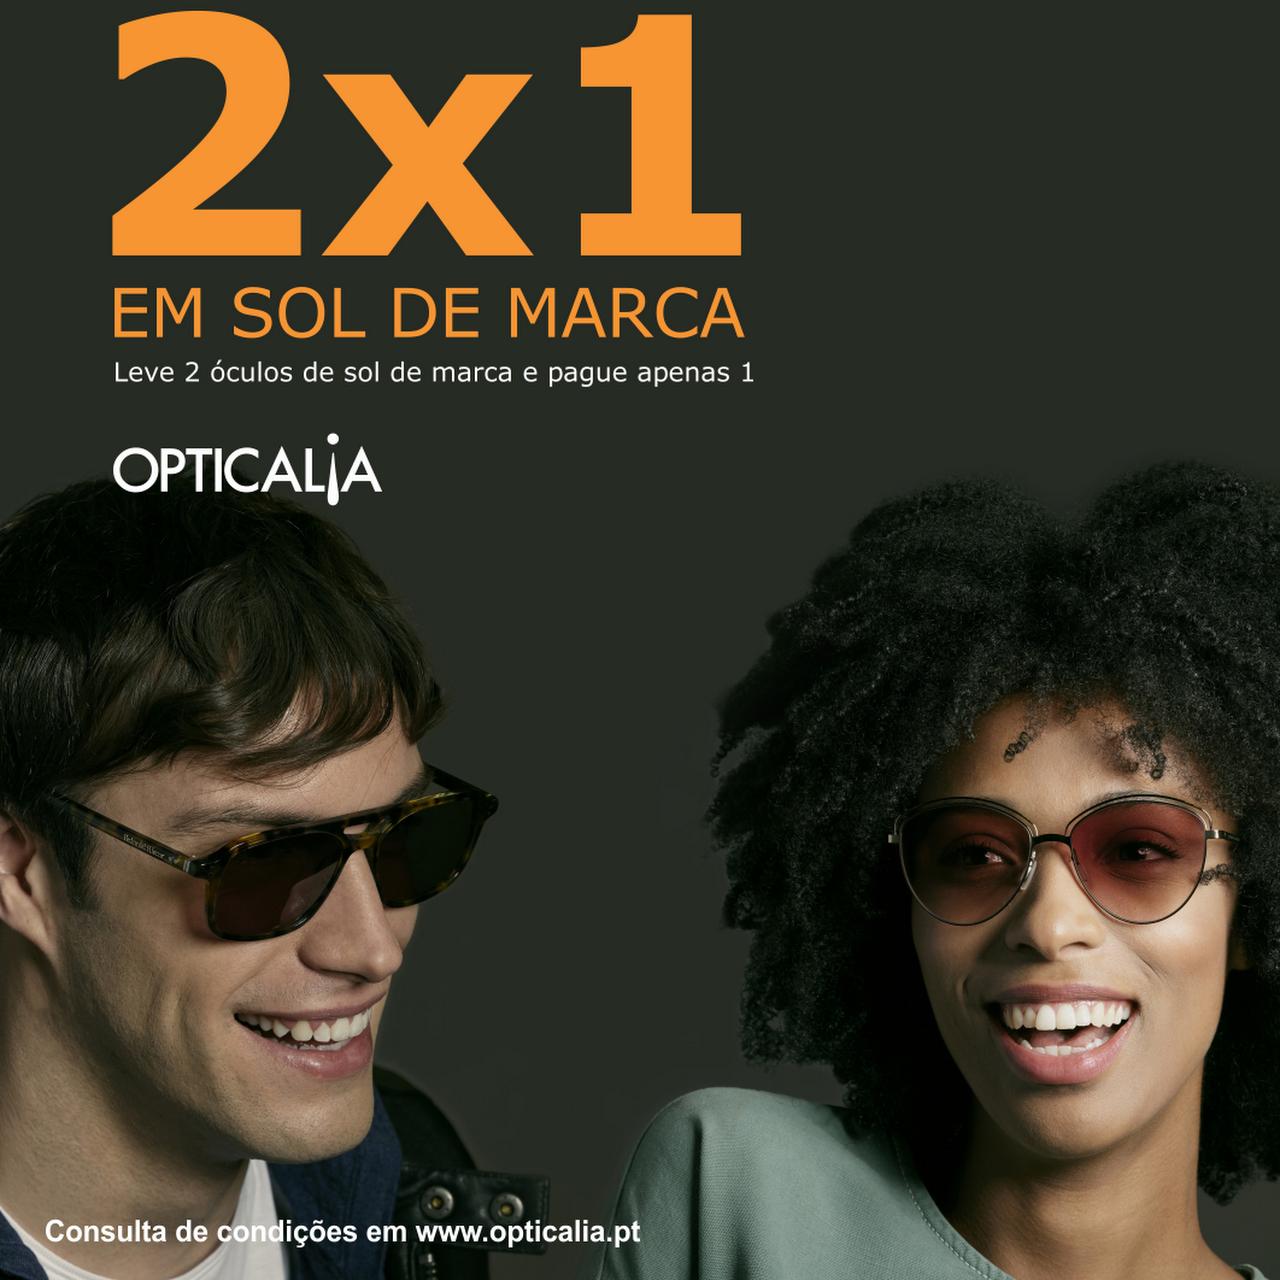 c15b27d08 Opticalia Famões - Oculista em Famões